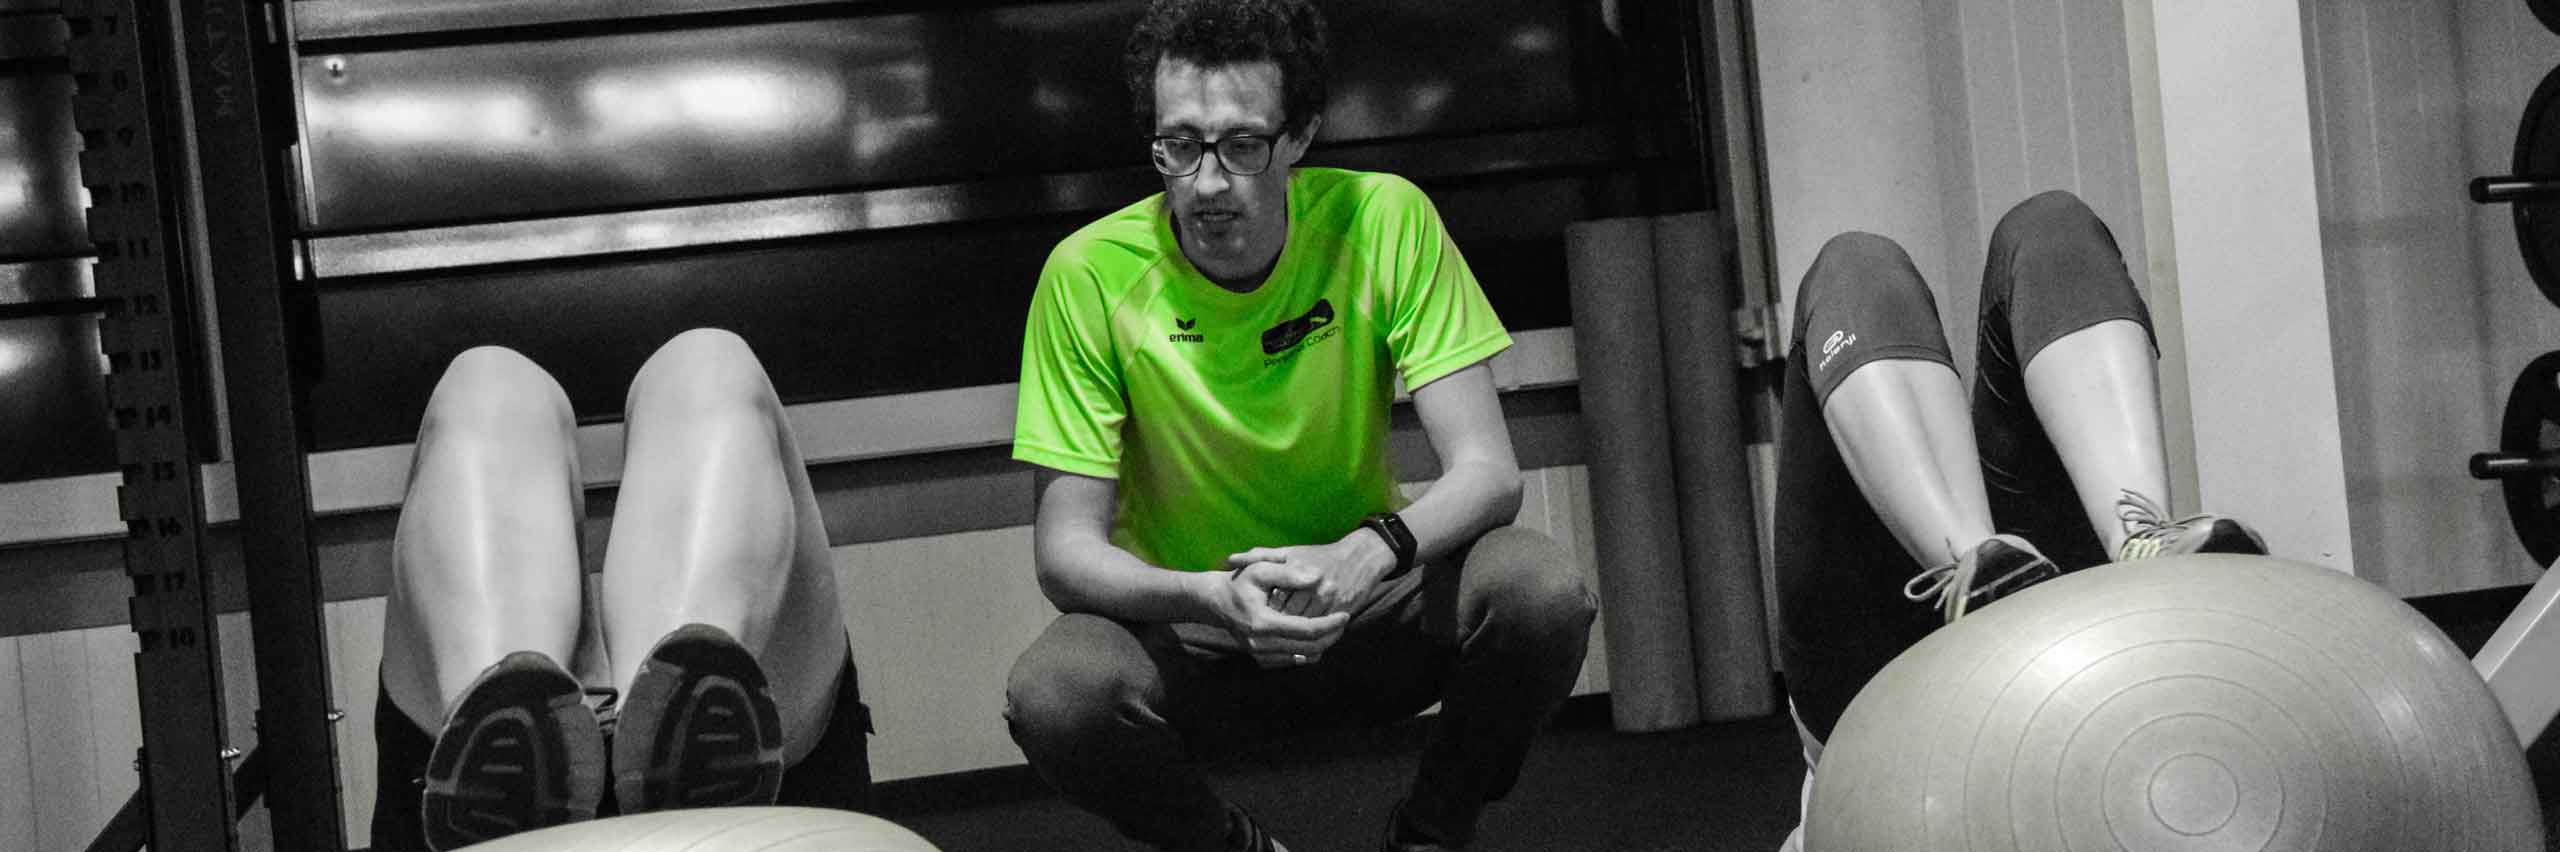 Onderkant-Sportscoach-pagina-web